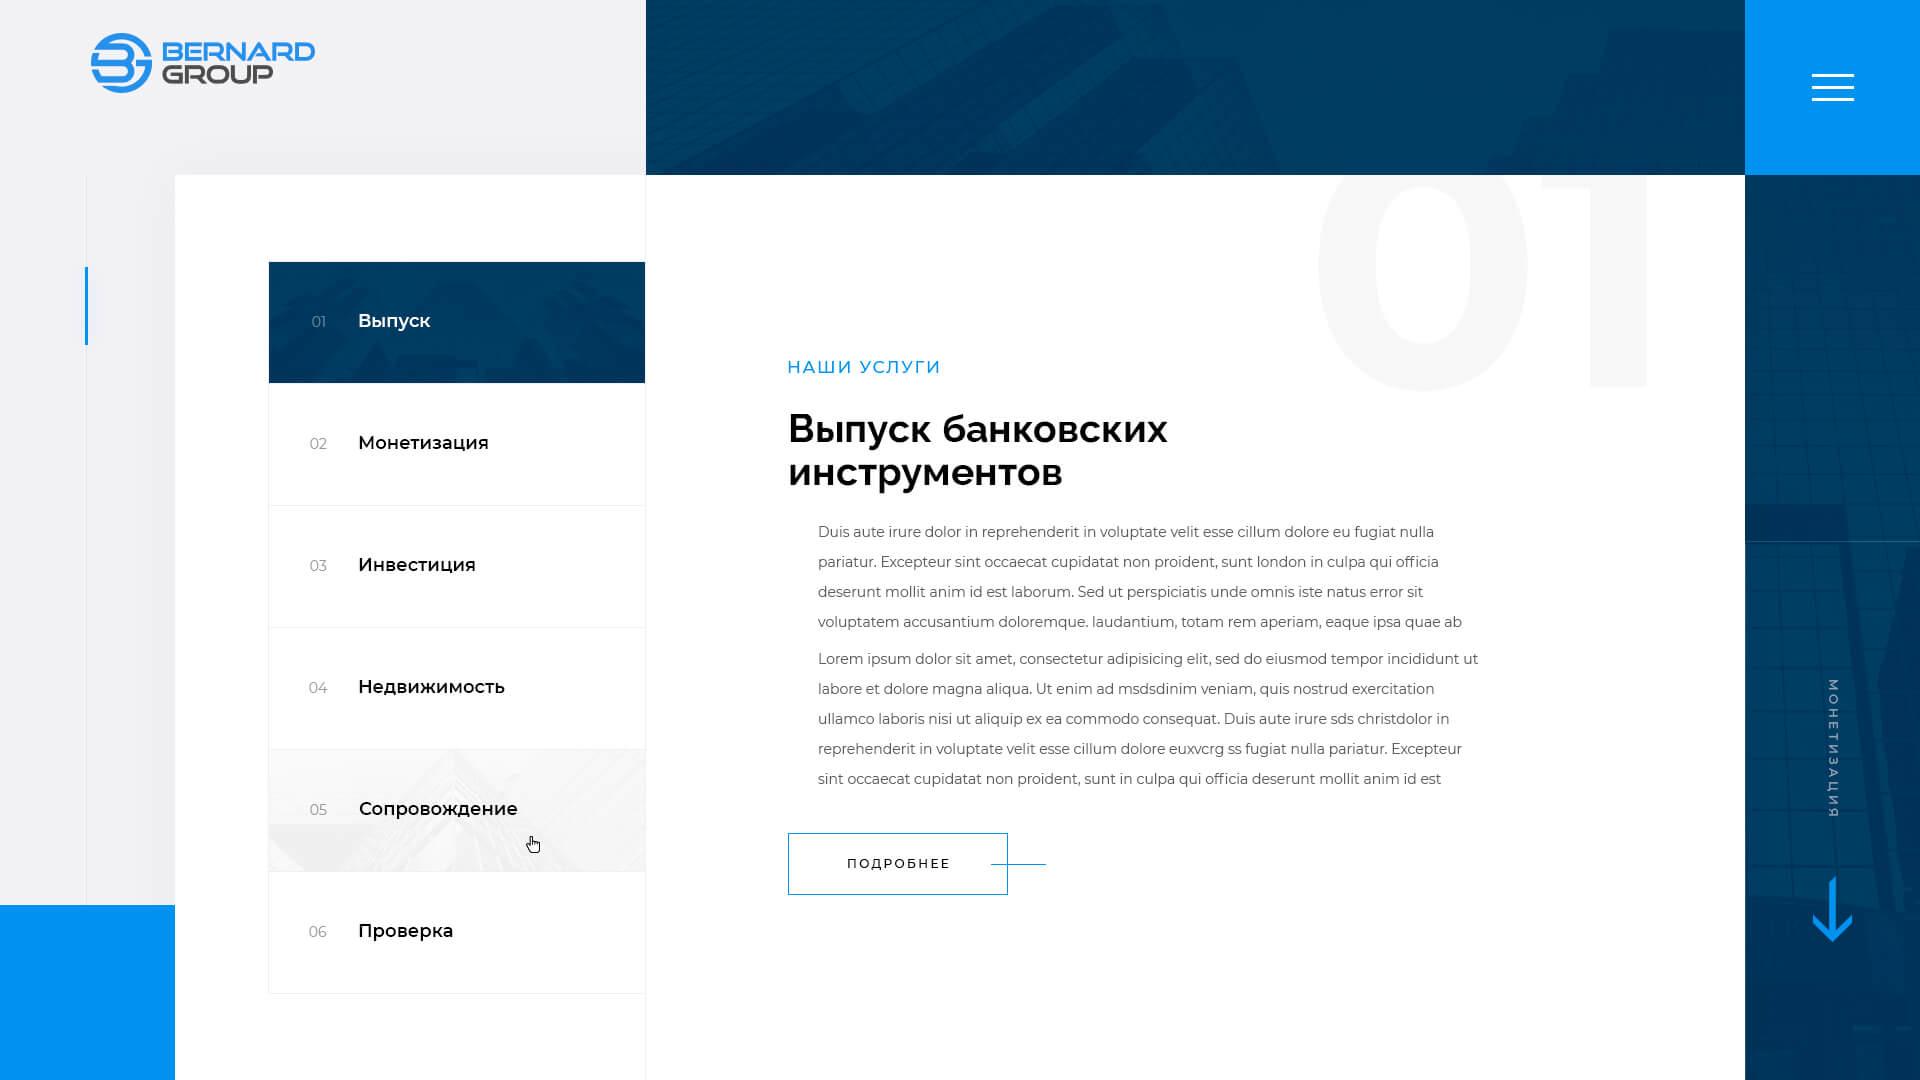 Bernard_Group_02_First_Service_Page_1.0